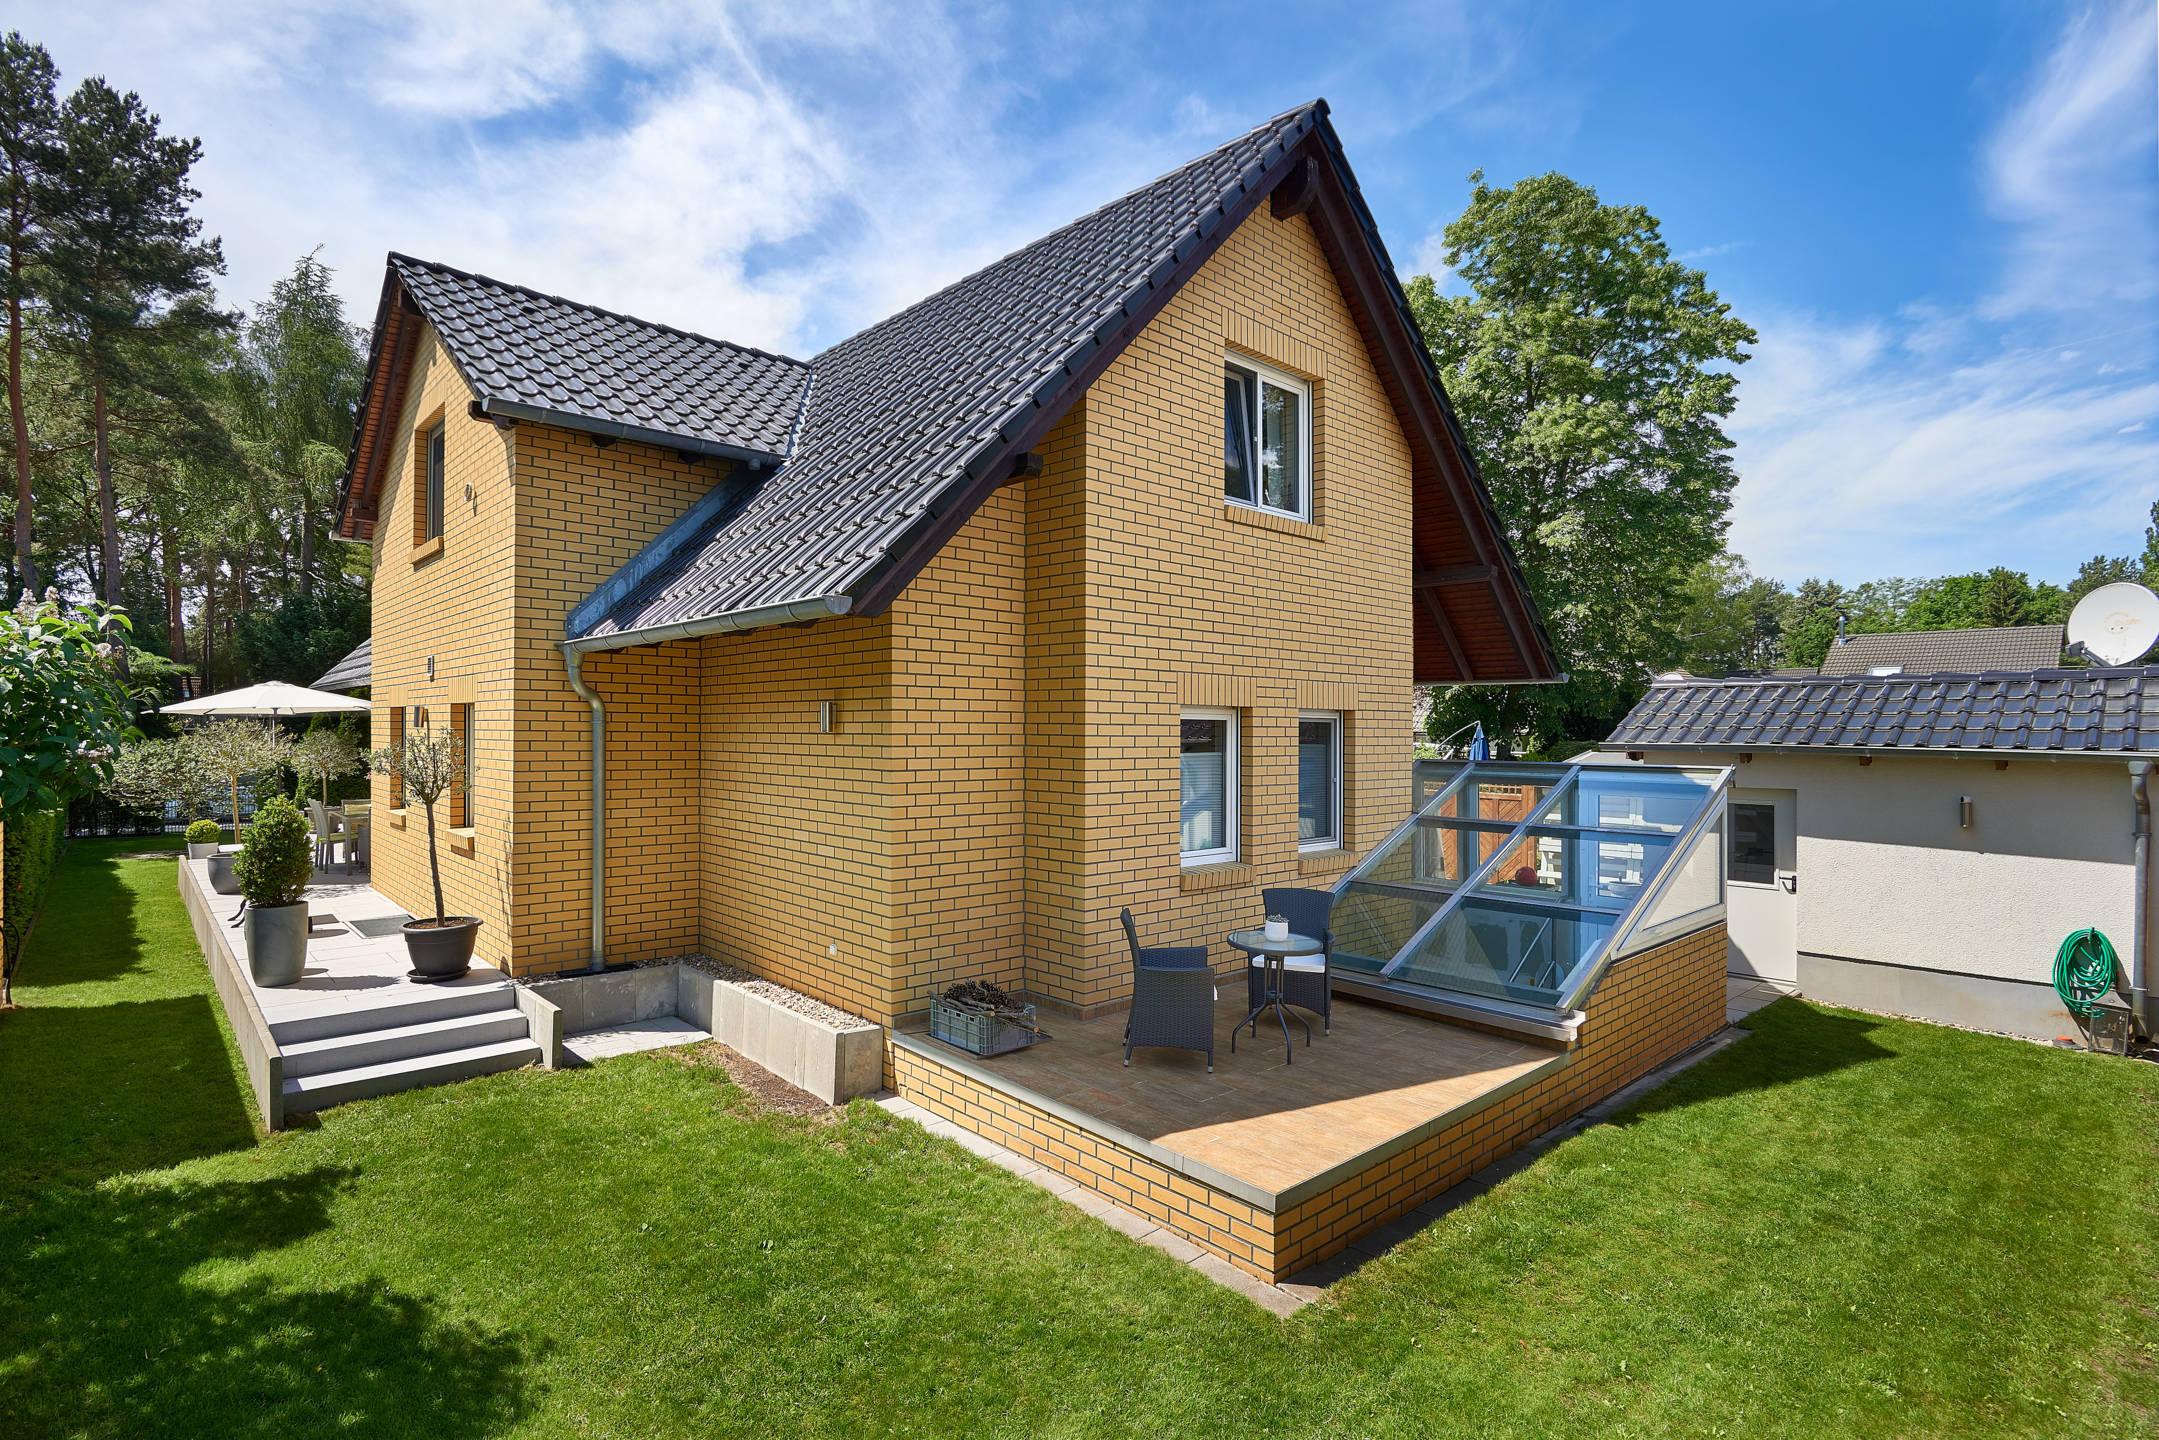 architecture thomas stibenz. Black Bedroom Furniture Sets. Home Design Ideas